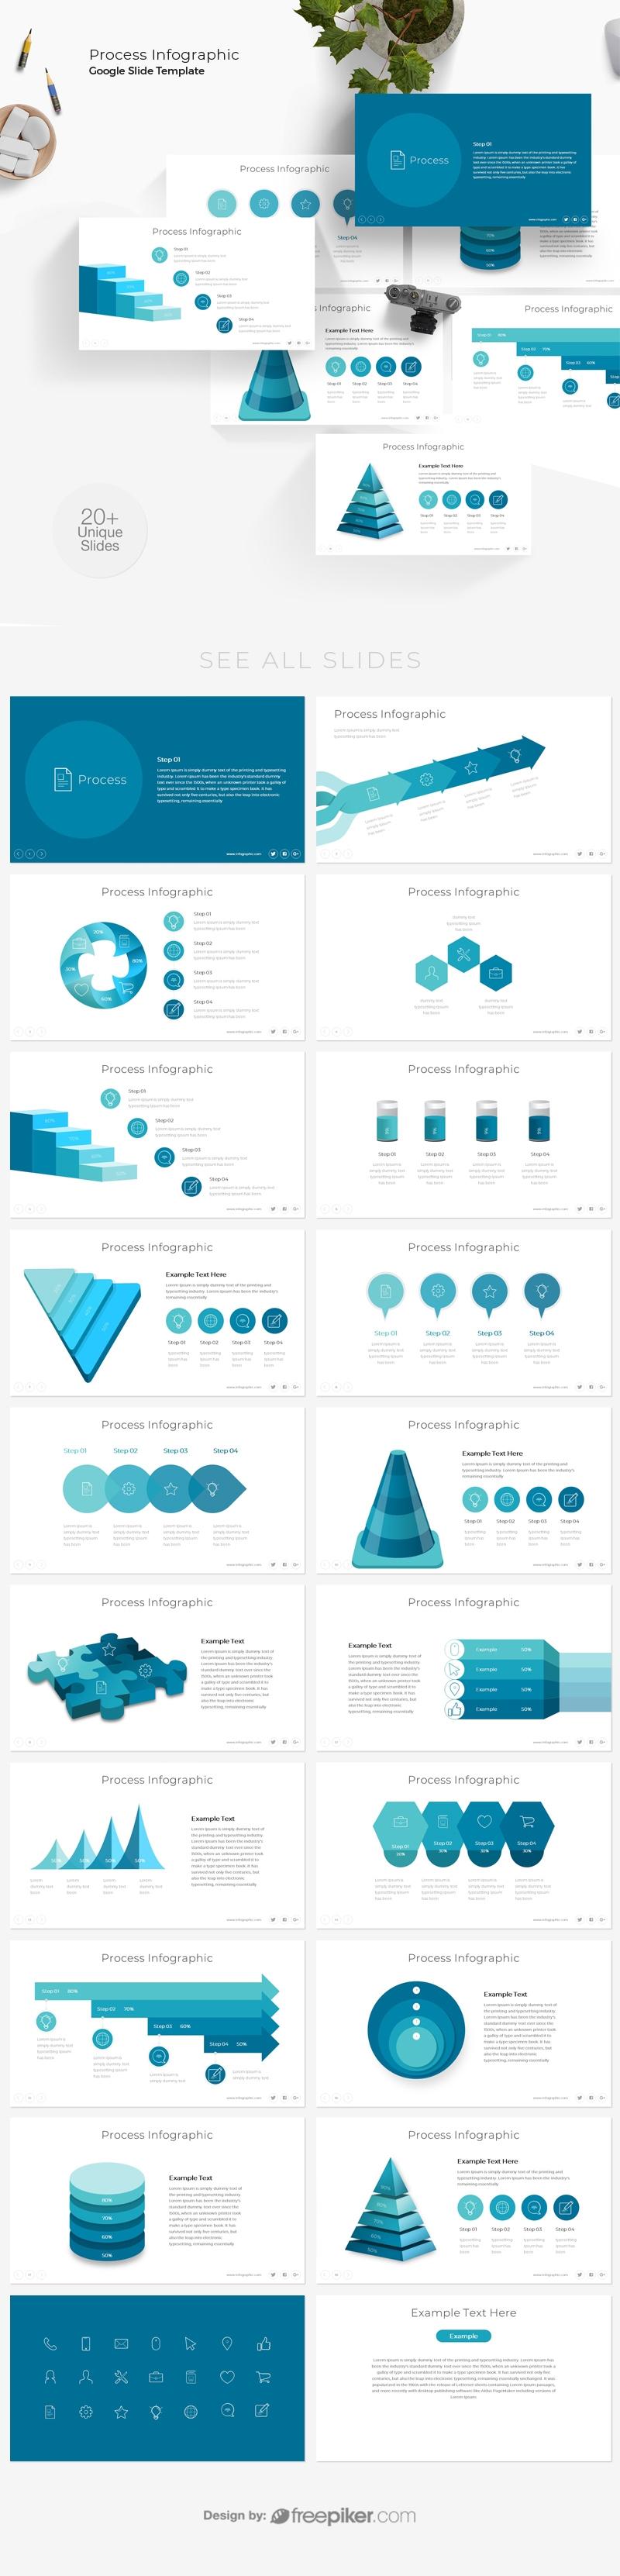 Process Infographic Google Slide Template